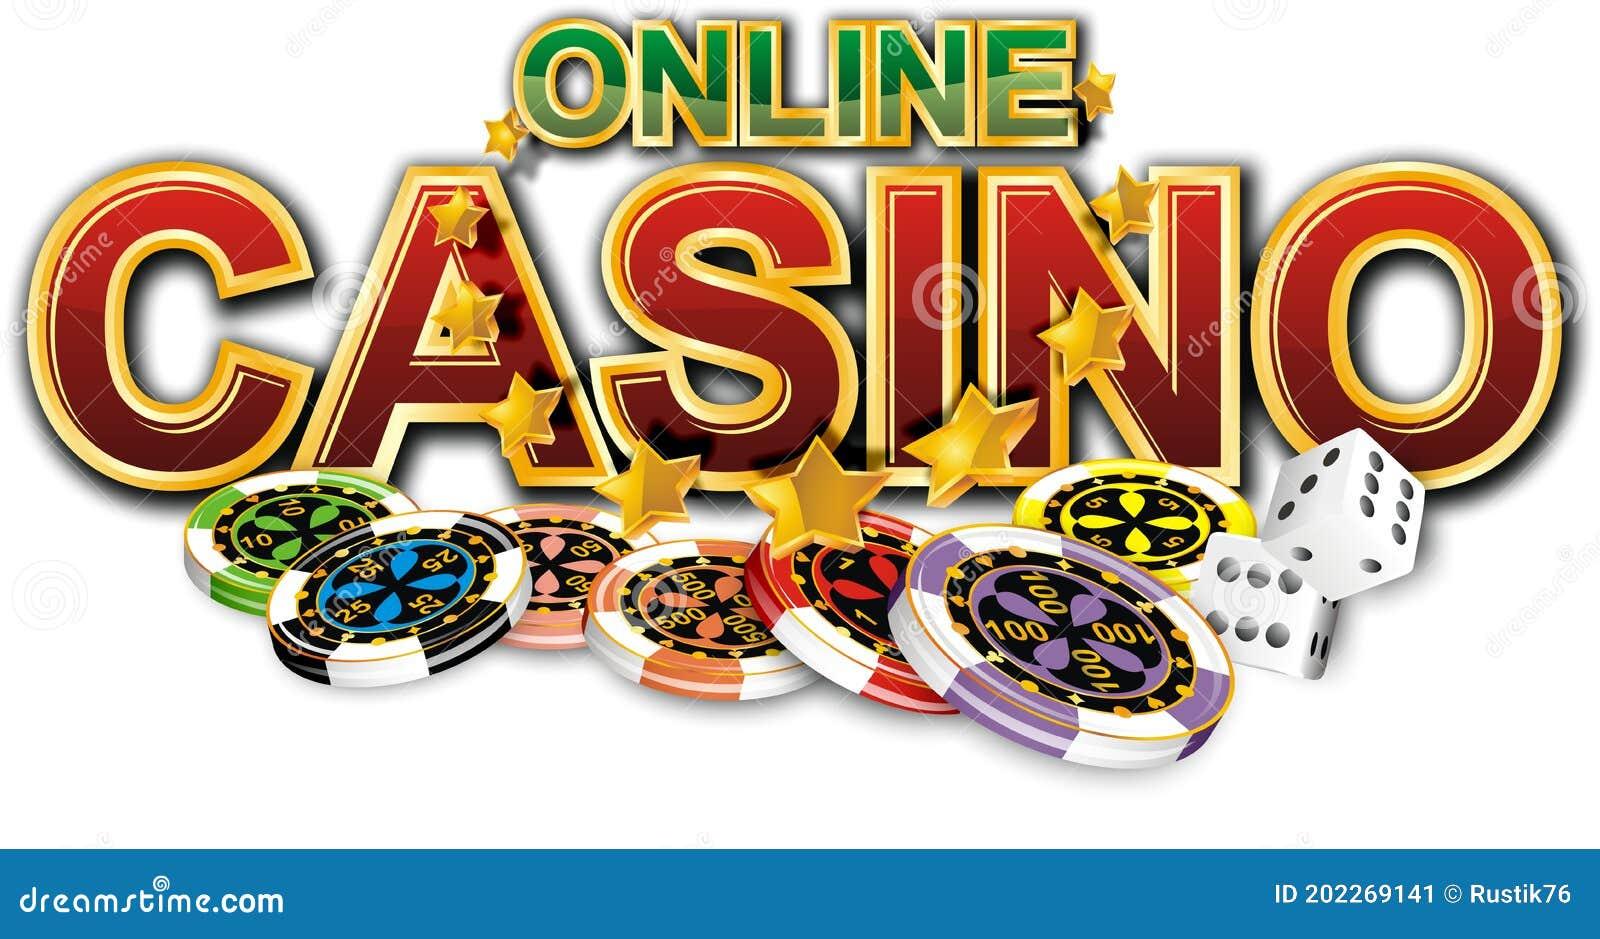 Giros online casino pocketdice 52907